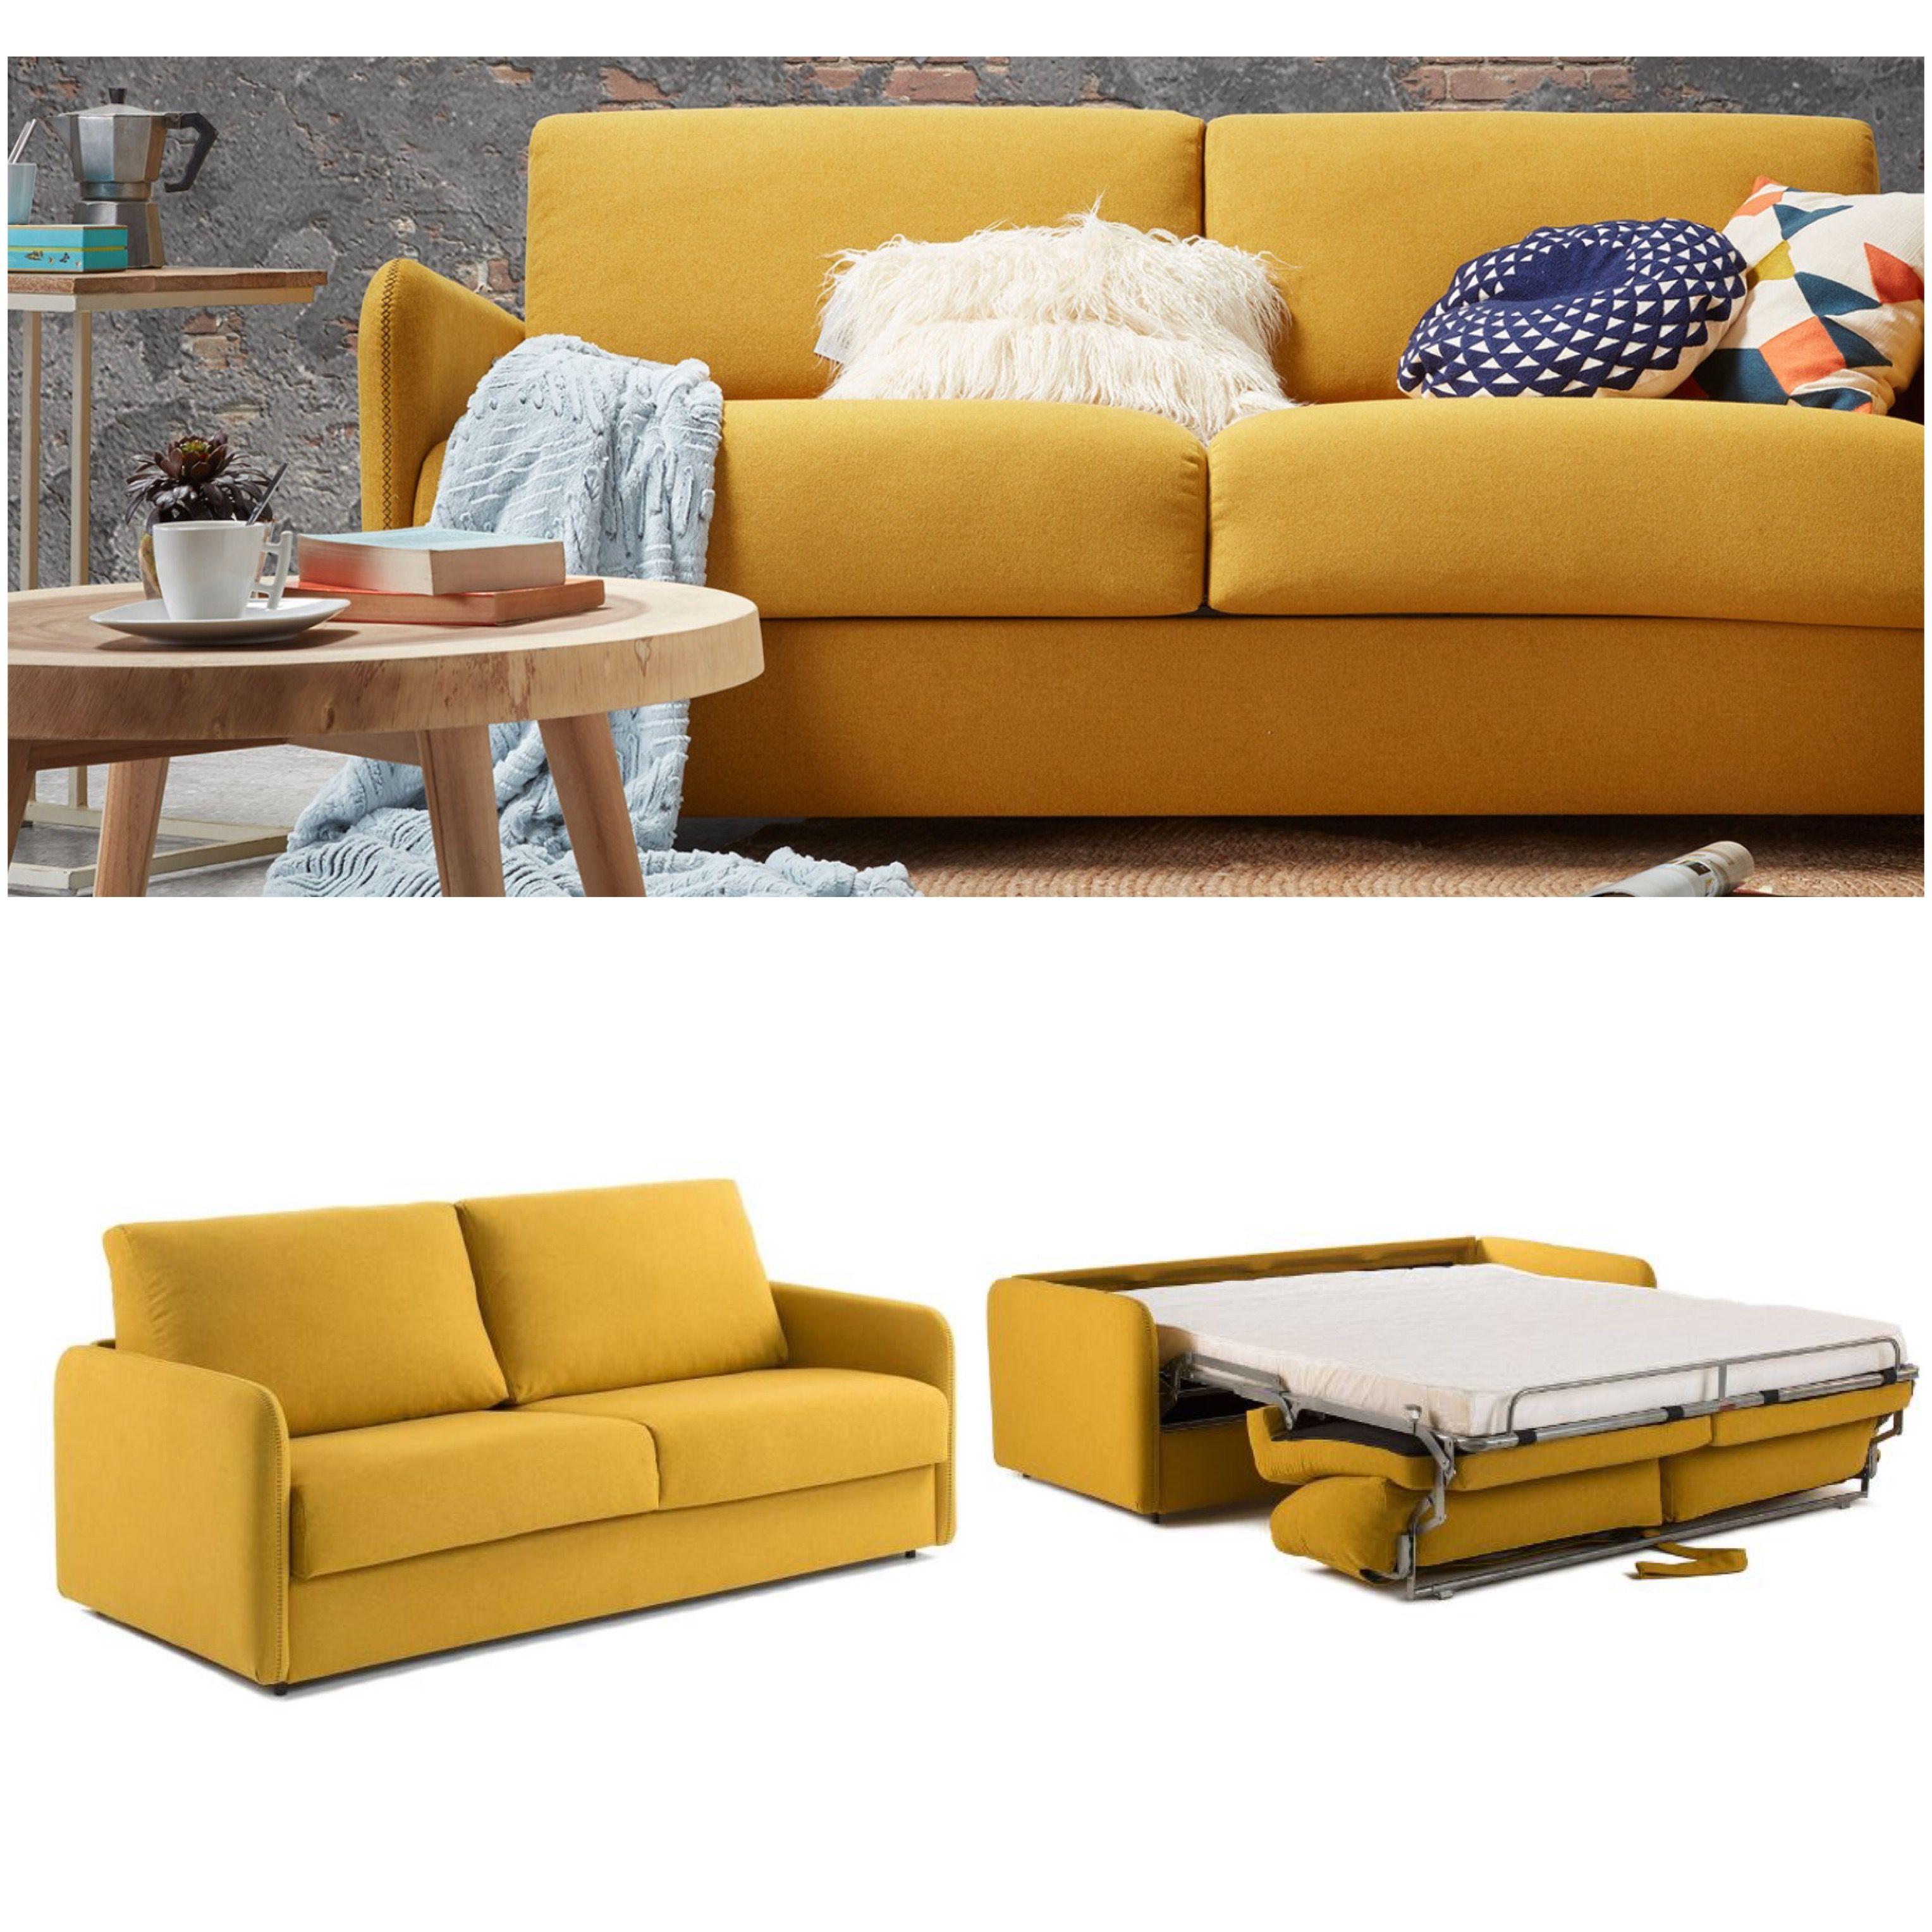 Utestående Sofa modell KOMOON😊 www.mirame.no #stue #sofa #innredning #møbler PP-97